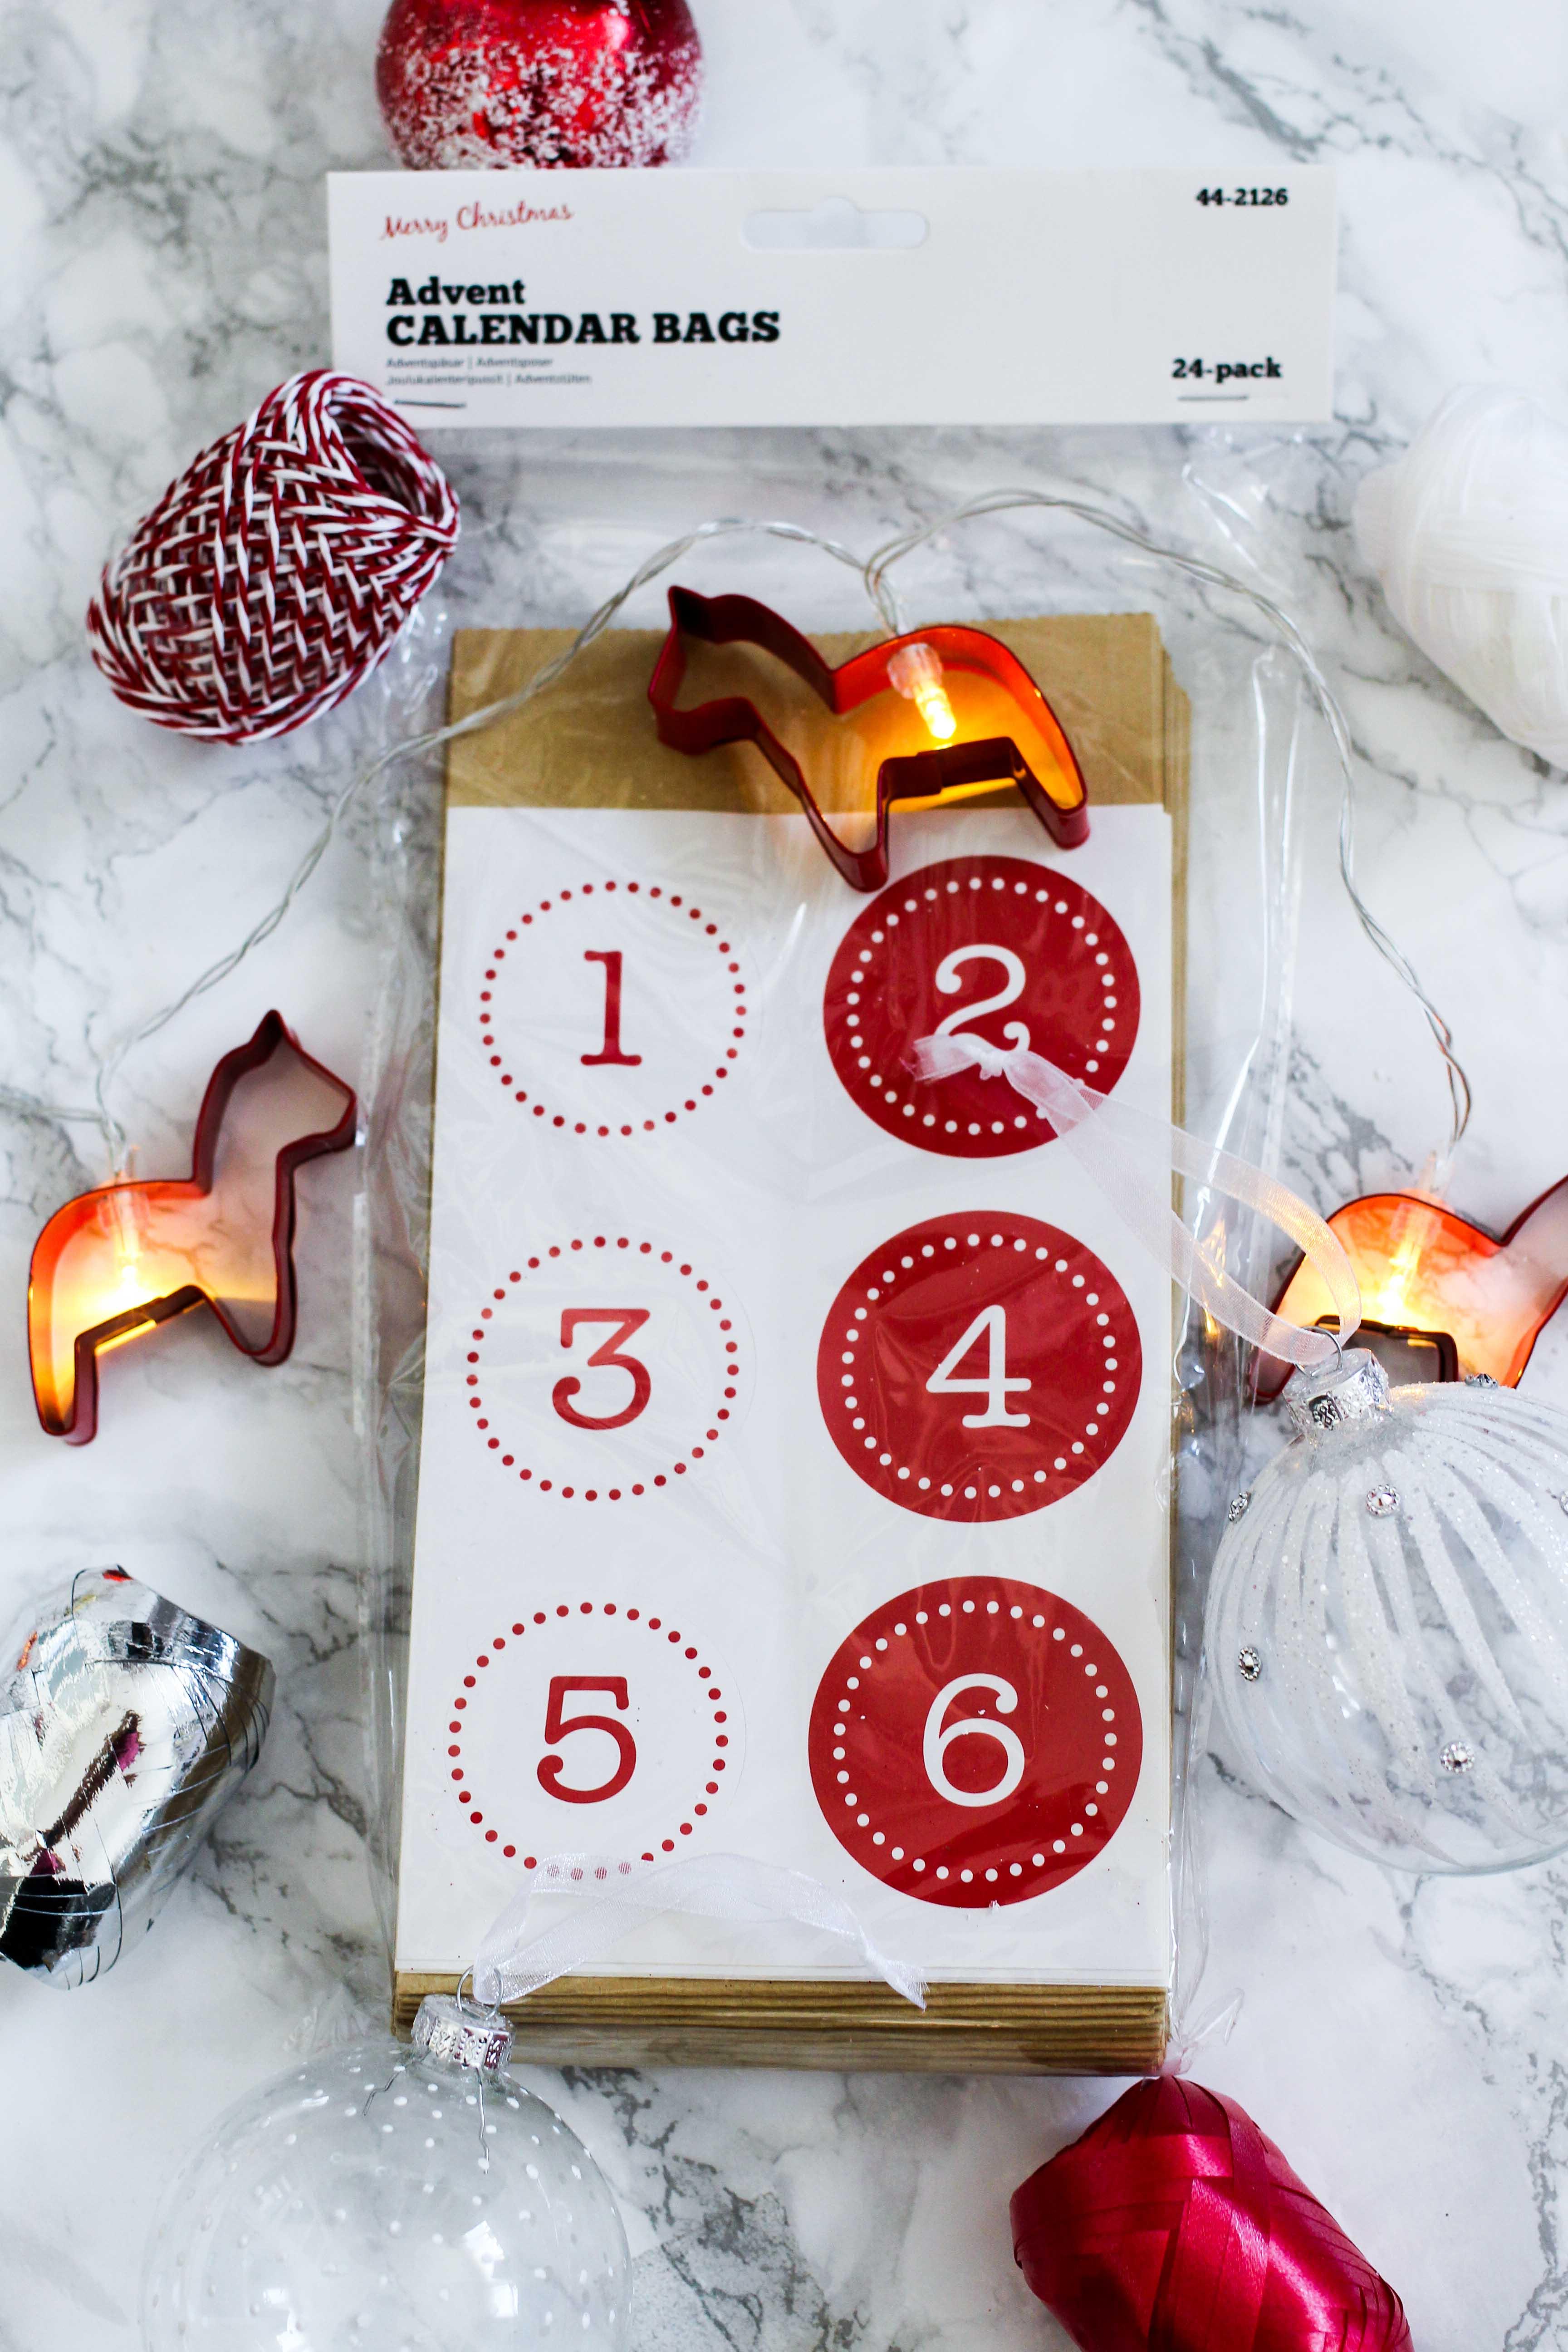 Geschenke kreativ einpacken Weihnachten Kreativer Christmas Gift Wrapping Guide Clas Ohlson Adventskalender selber machen